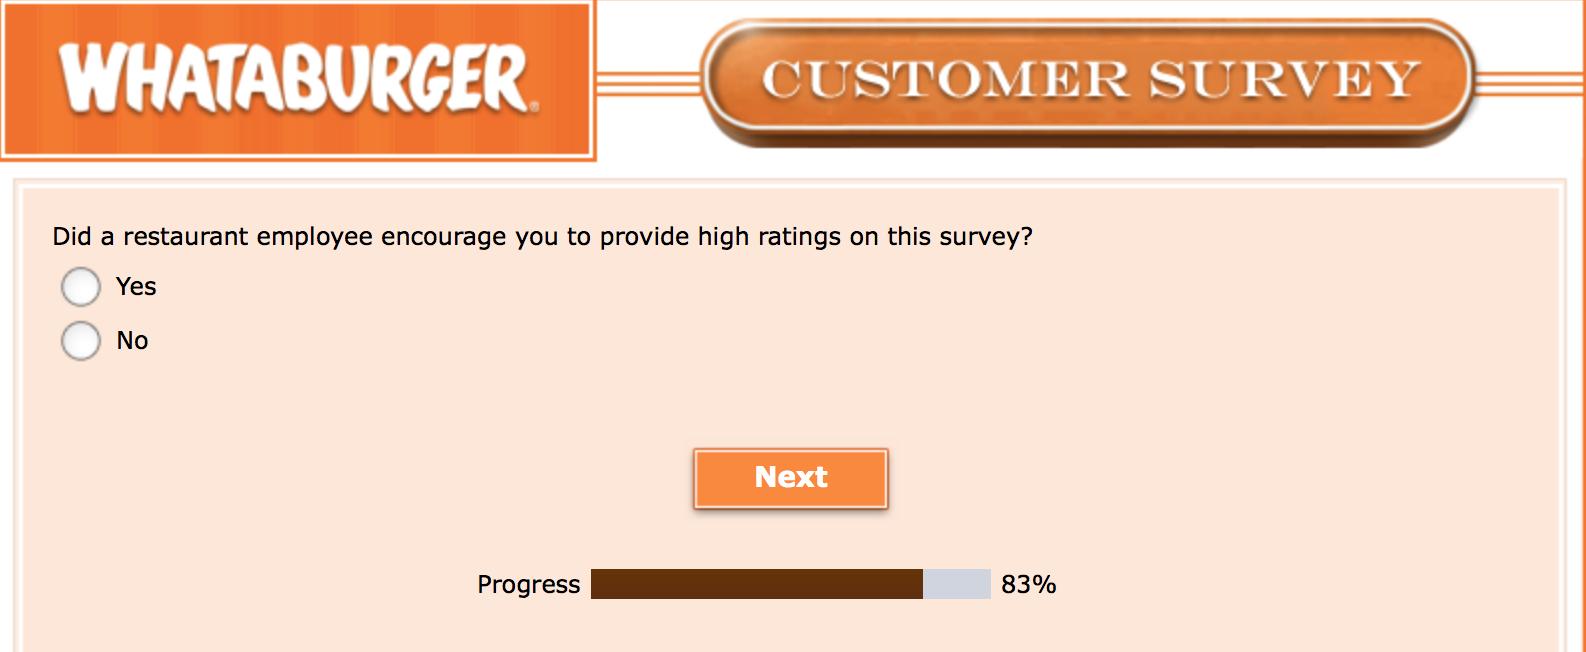 Whataburger Survey 28